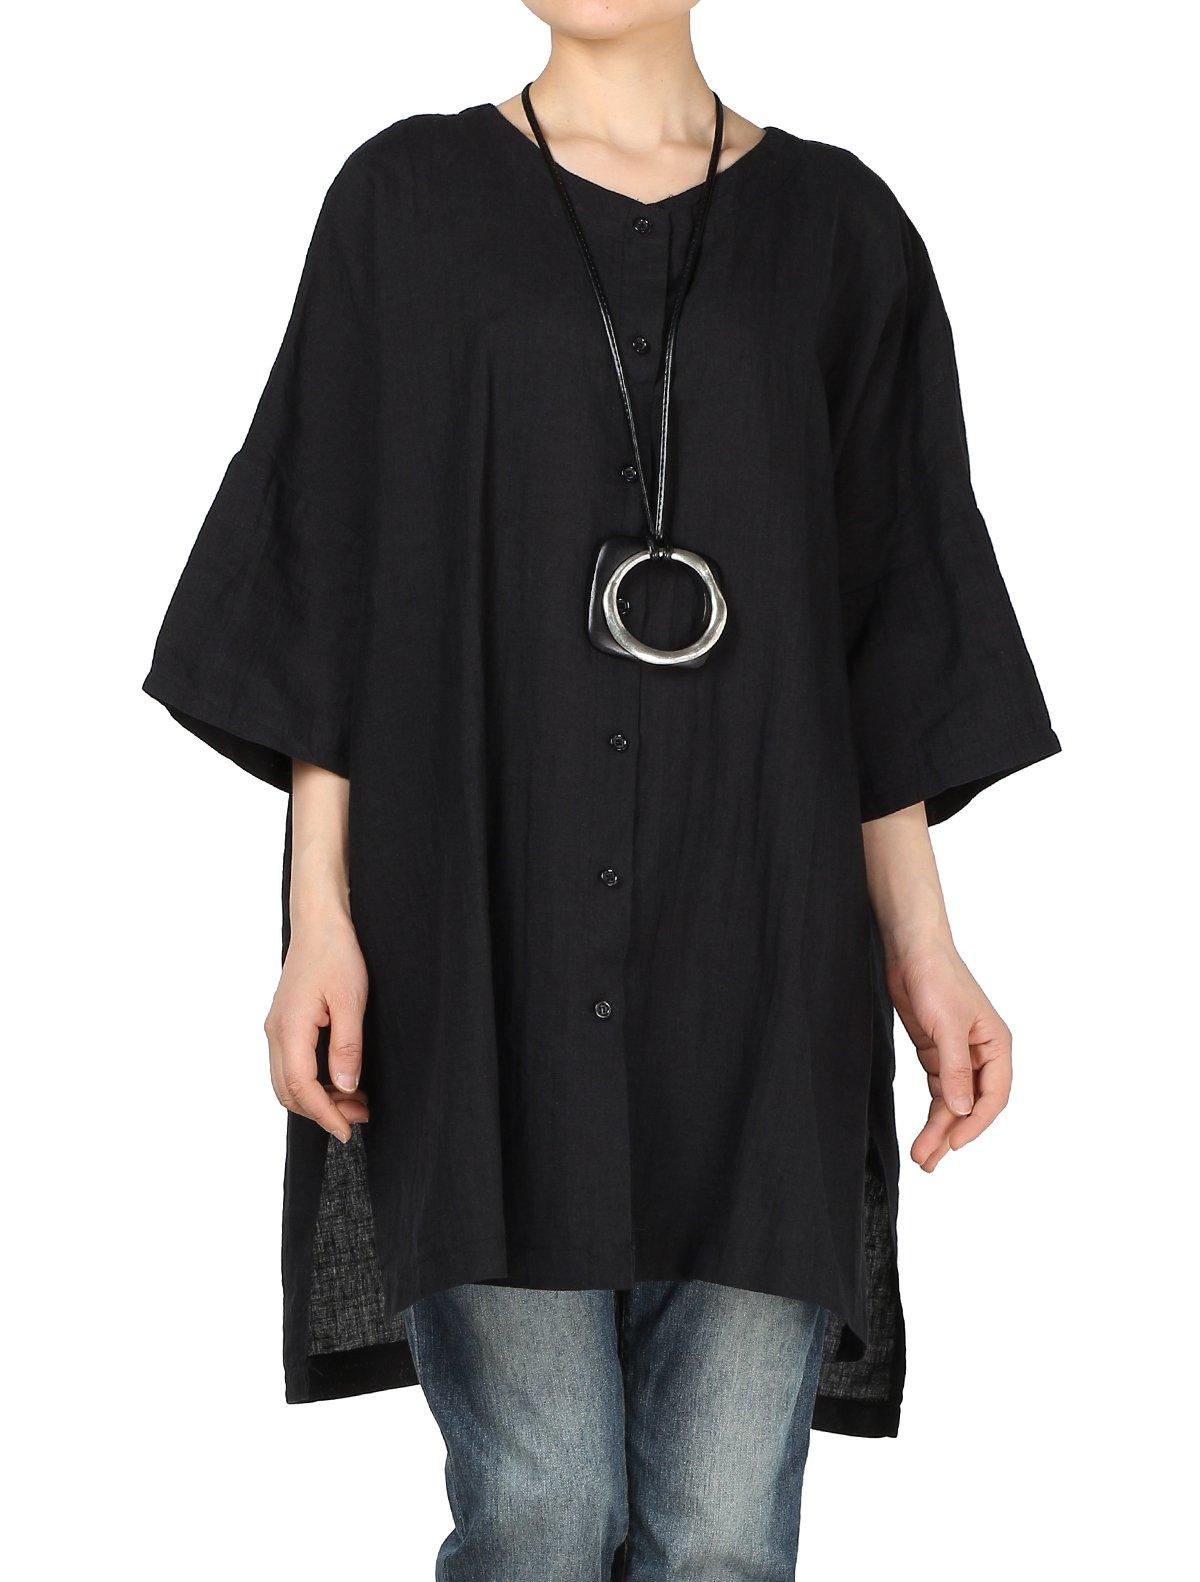 Mordenmiss Women's Summer Plus Size Round Neck Side Slit Blouse Shirt XL Black